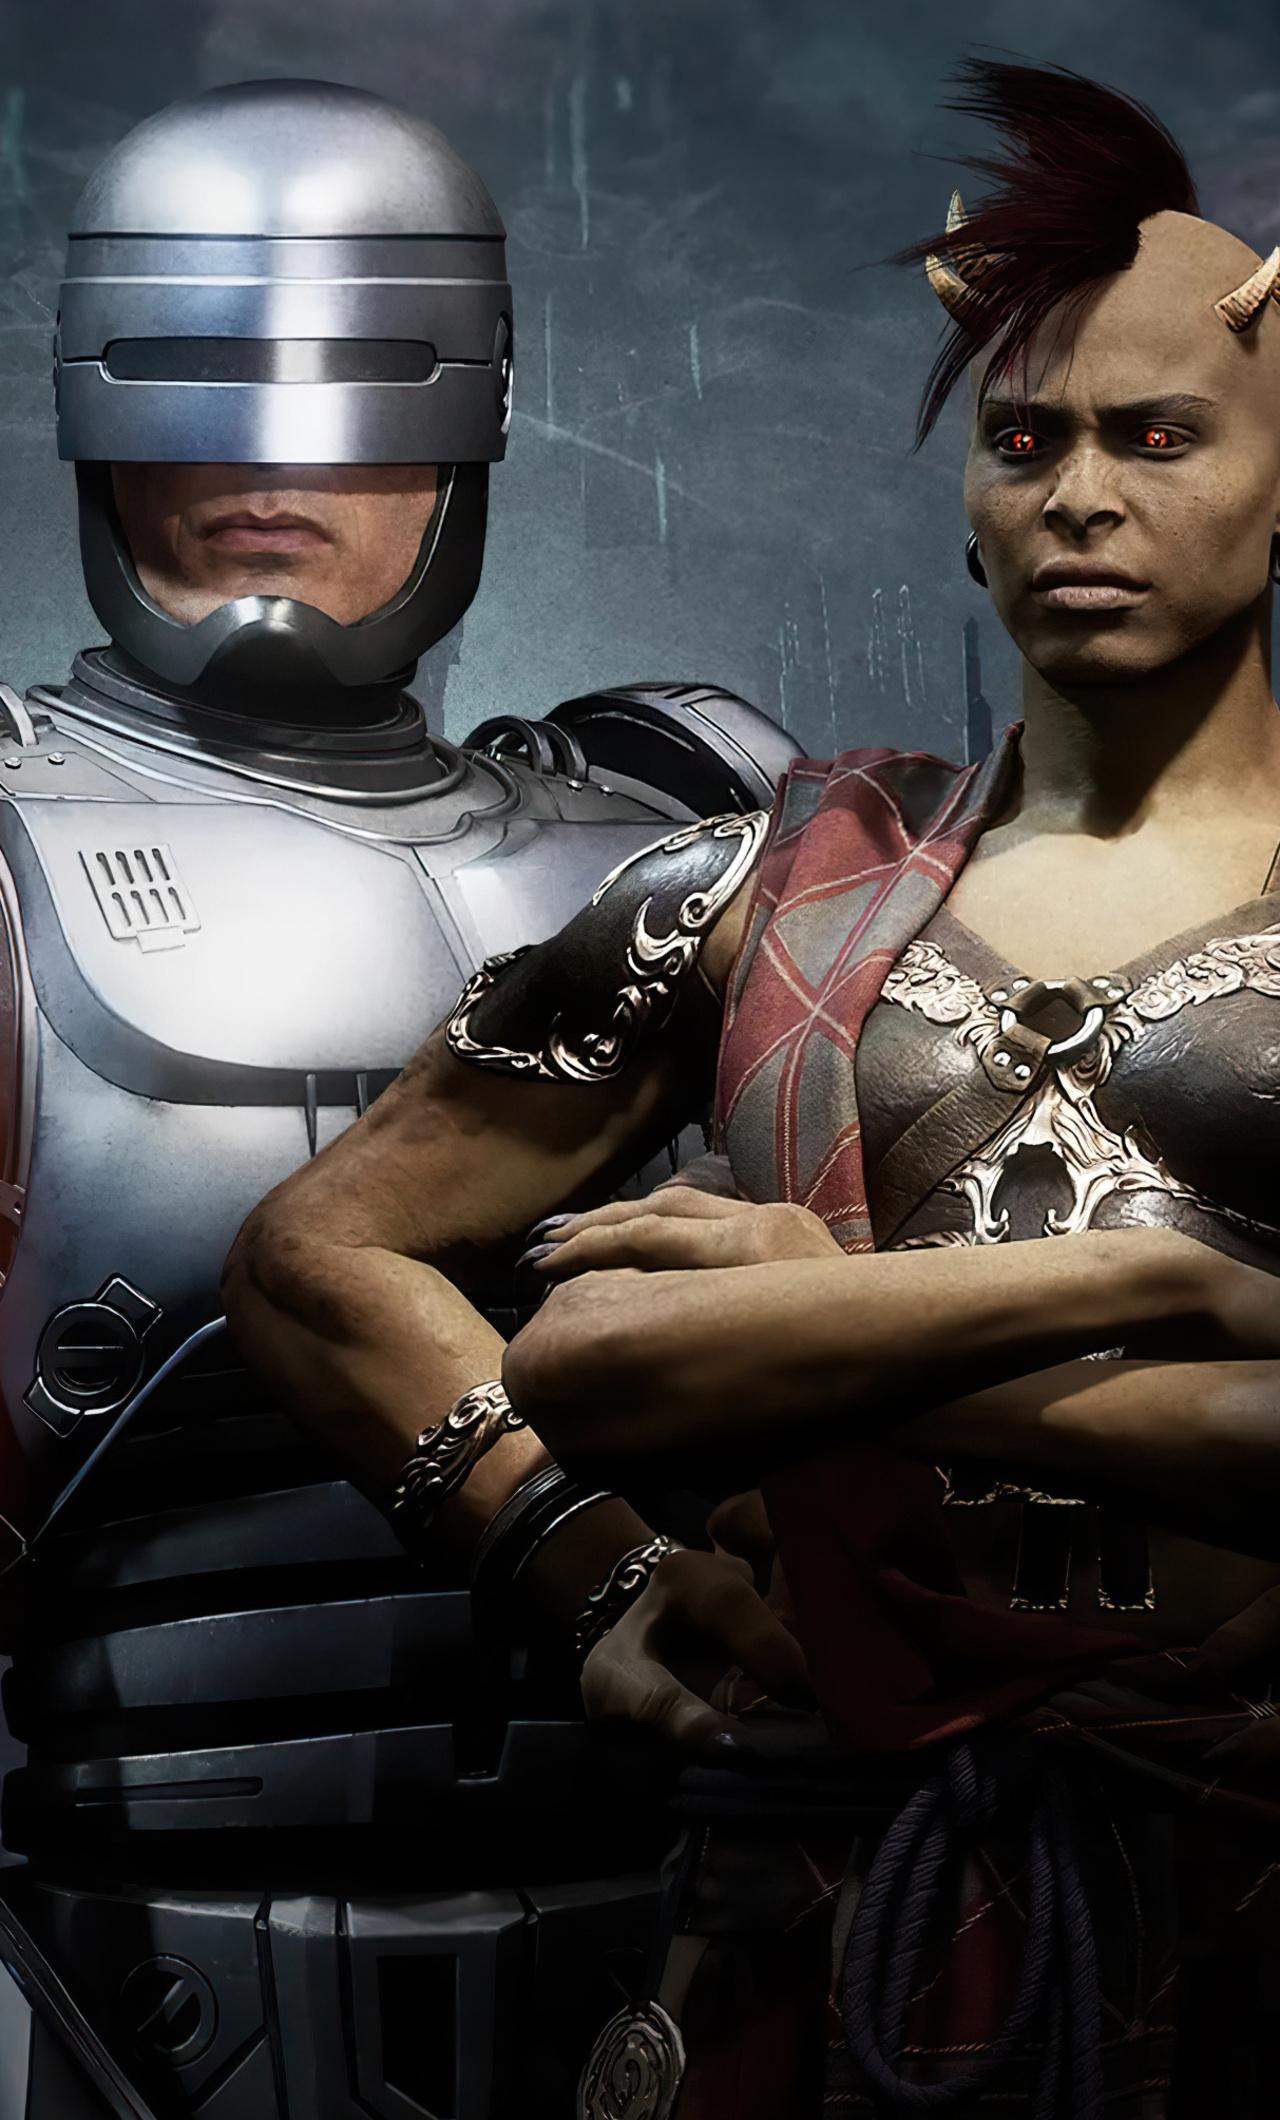 1280x2120 Mortal Kombat 11 Aftermath Fujin Sheeva And Robocop 4k